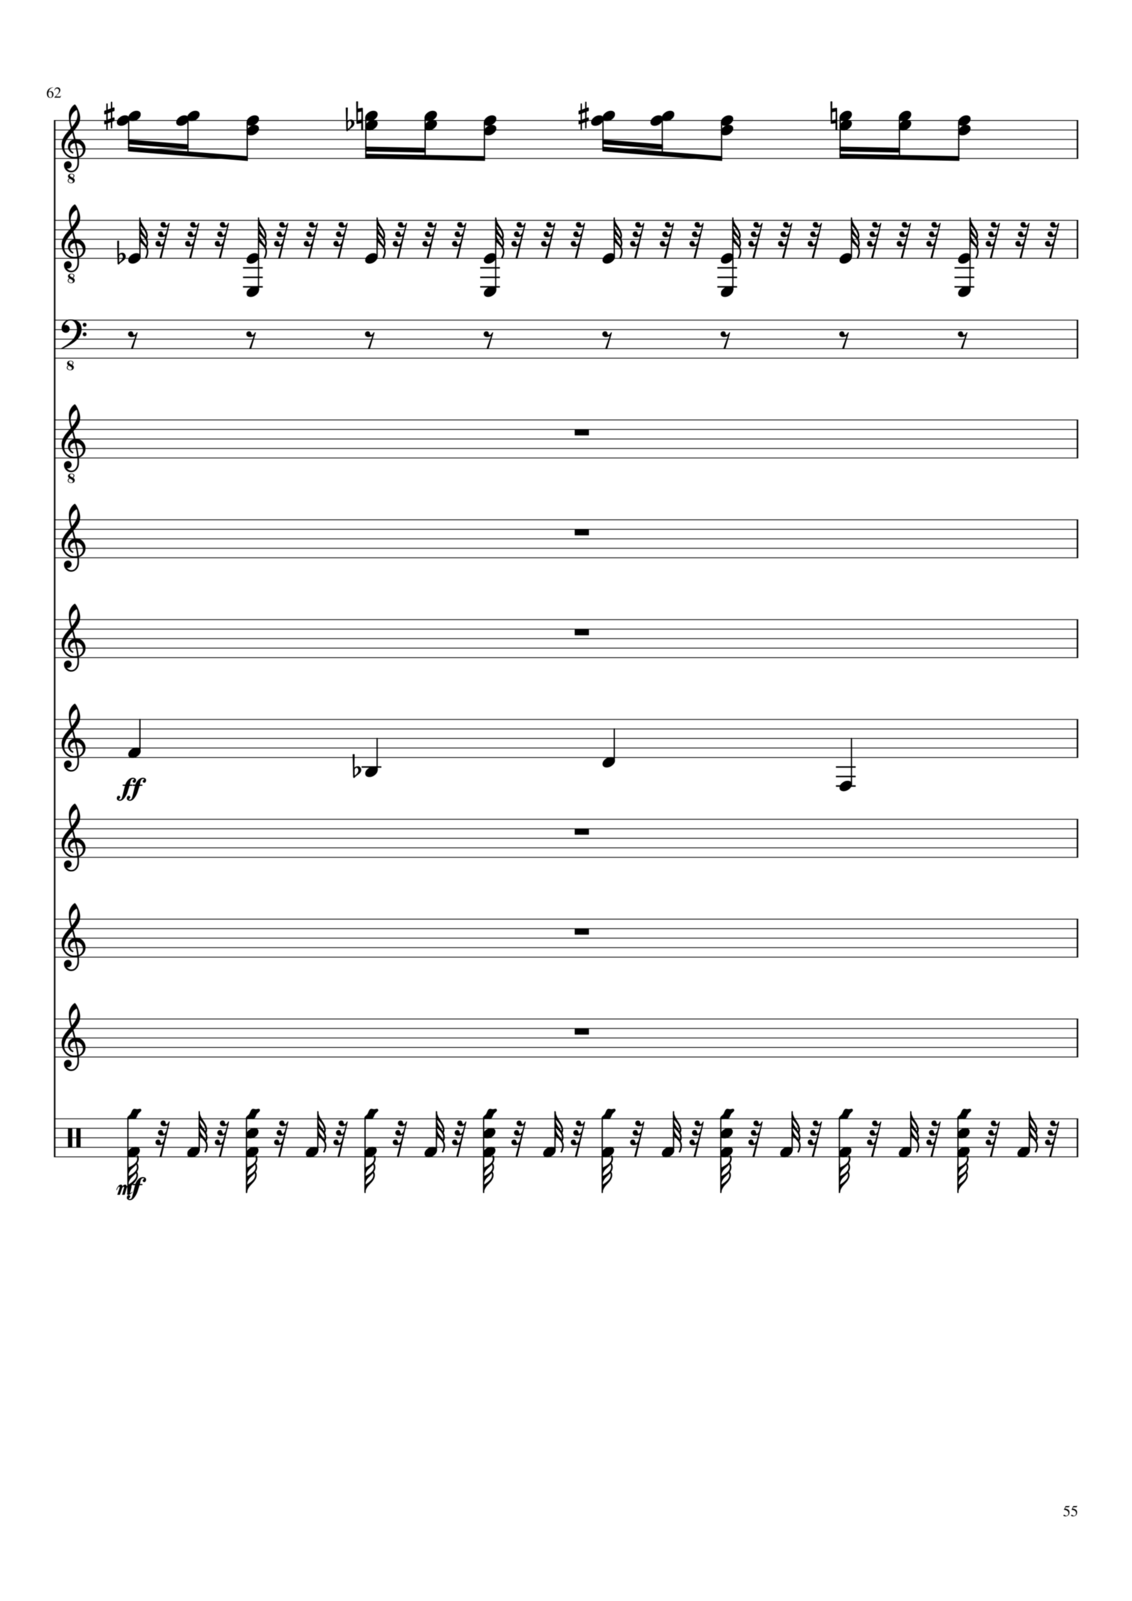 Belyiy sokol slide, Image 55